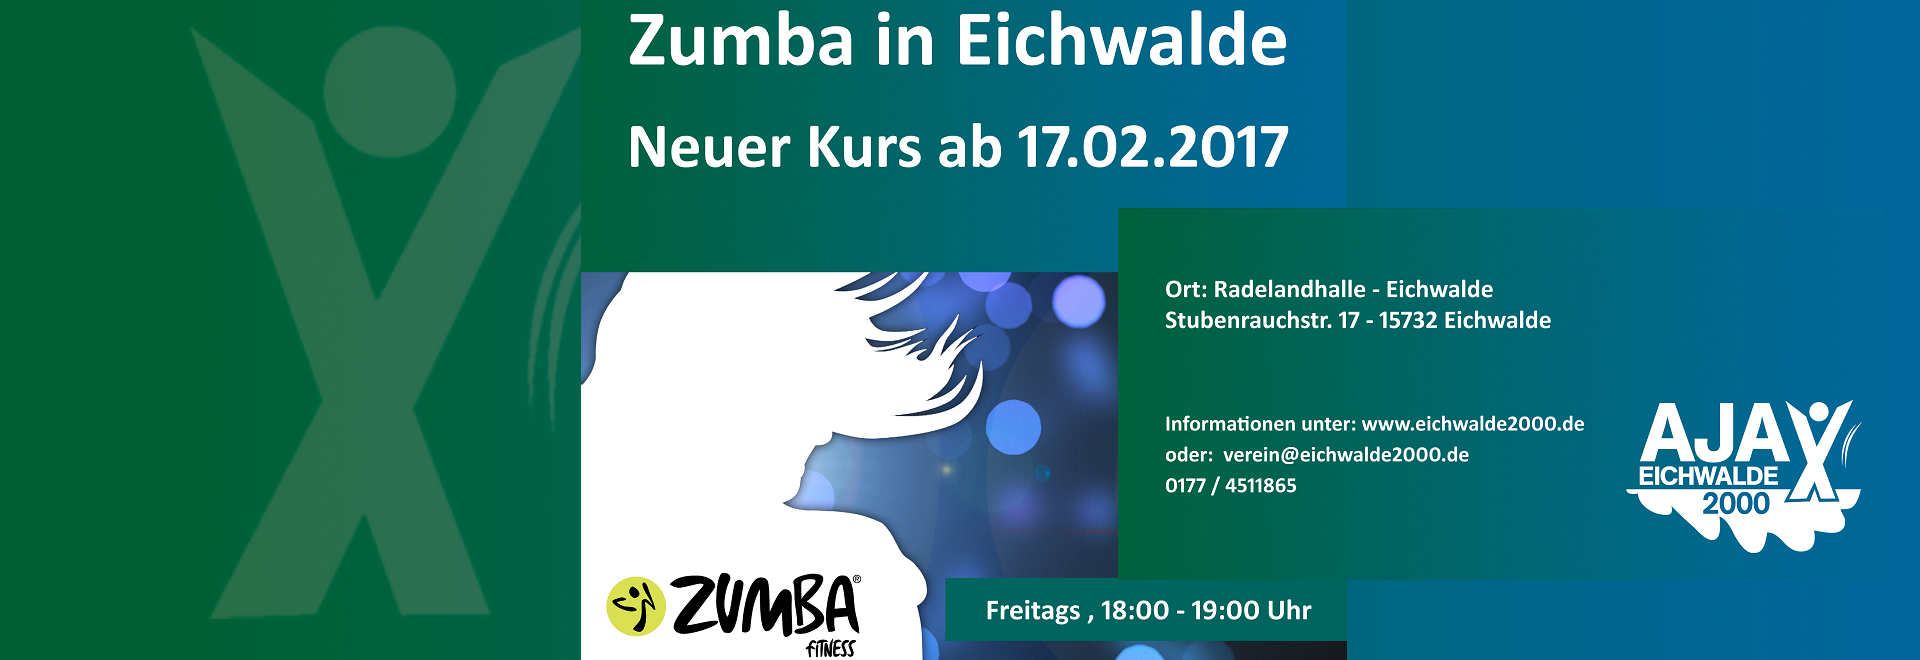 Banner-Website_Zumba